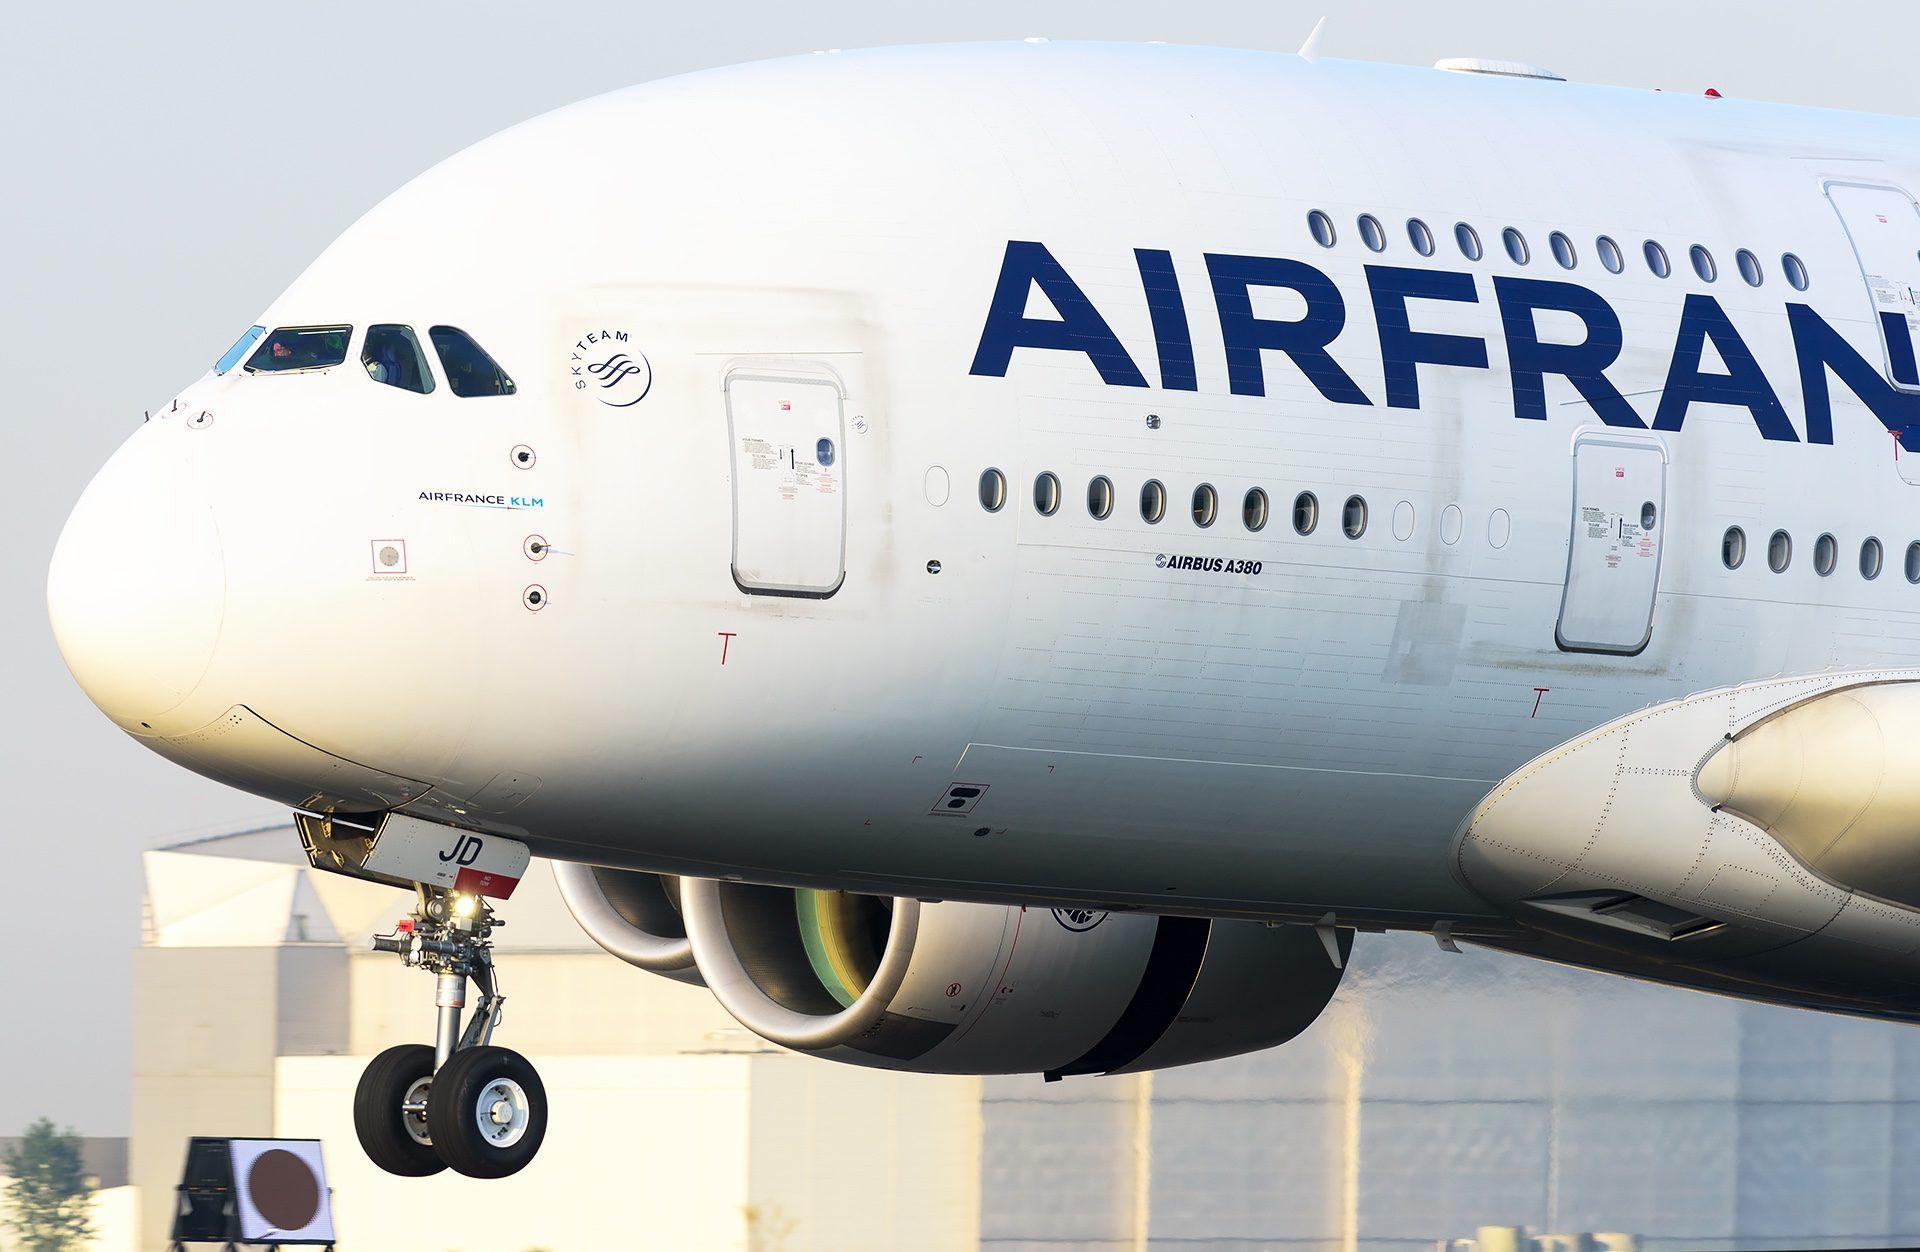 F-HPJD A380 AIR FRANCE